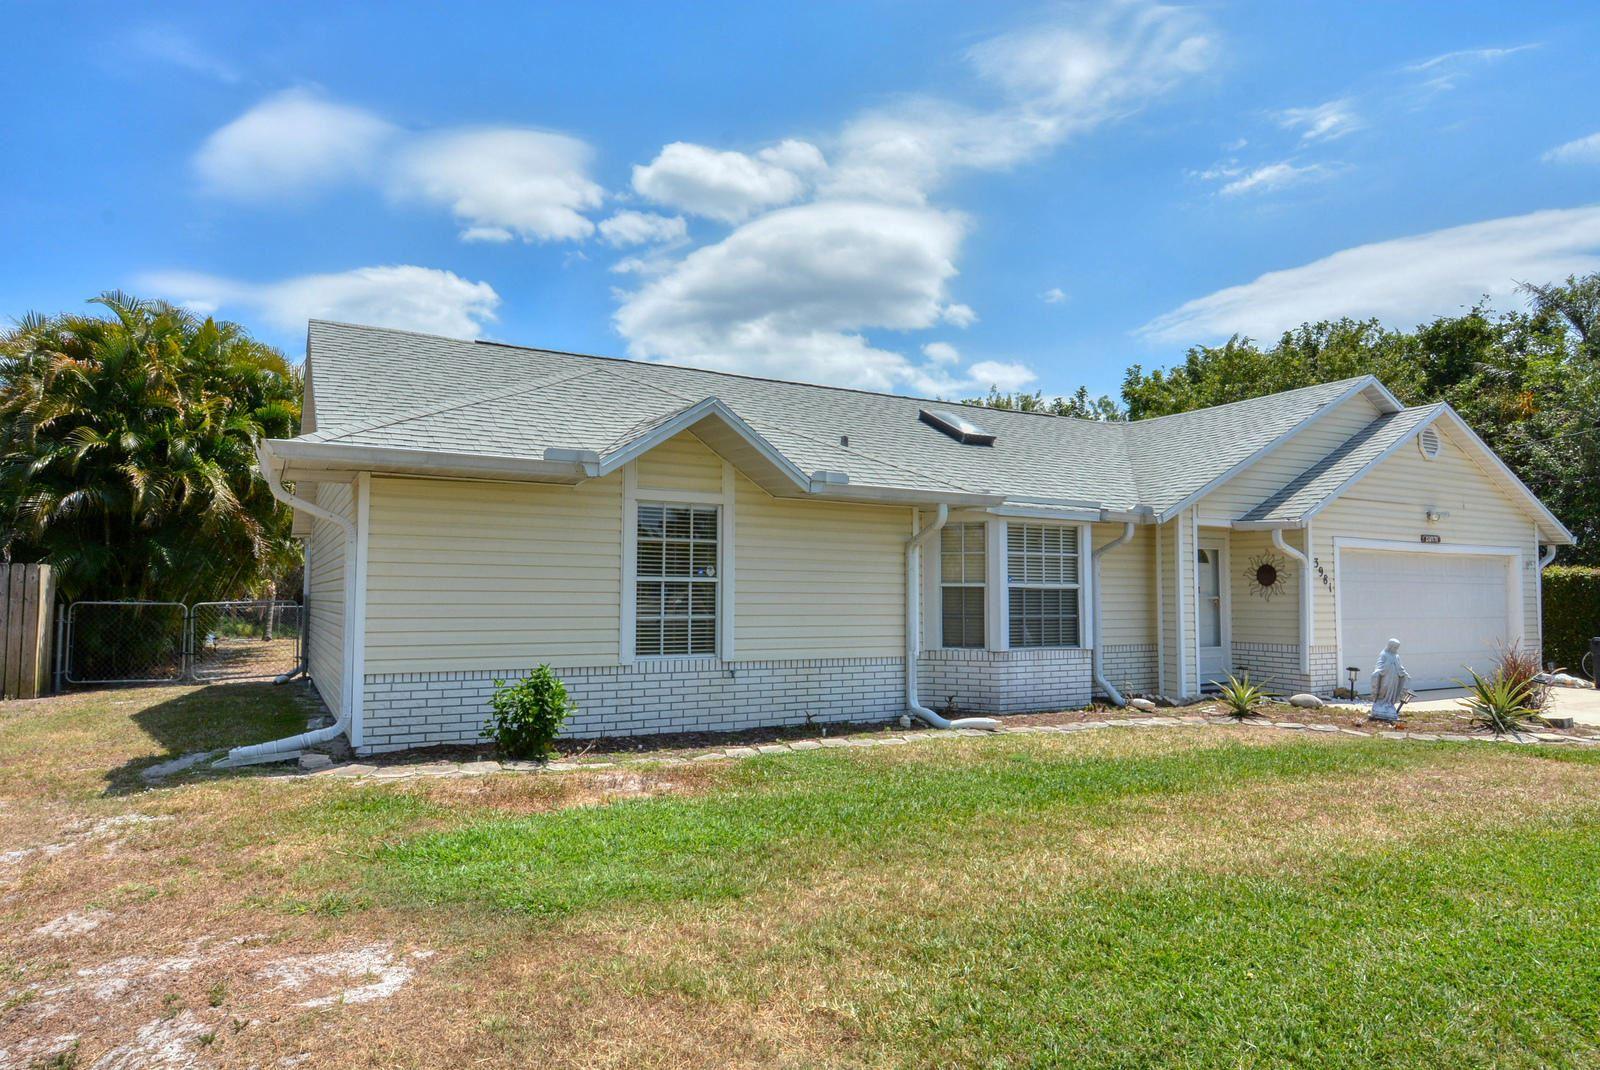 3981 SW Mccrory Street, Port Saint Lucie, FL 34953 - MLS#: RX-10707481